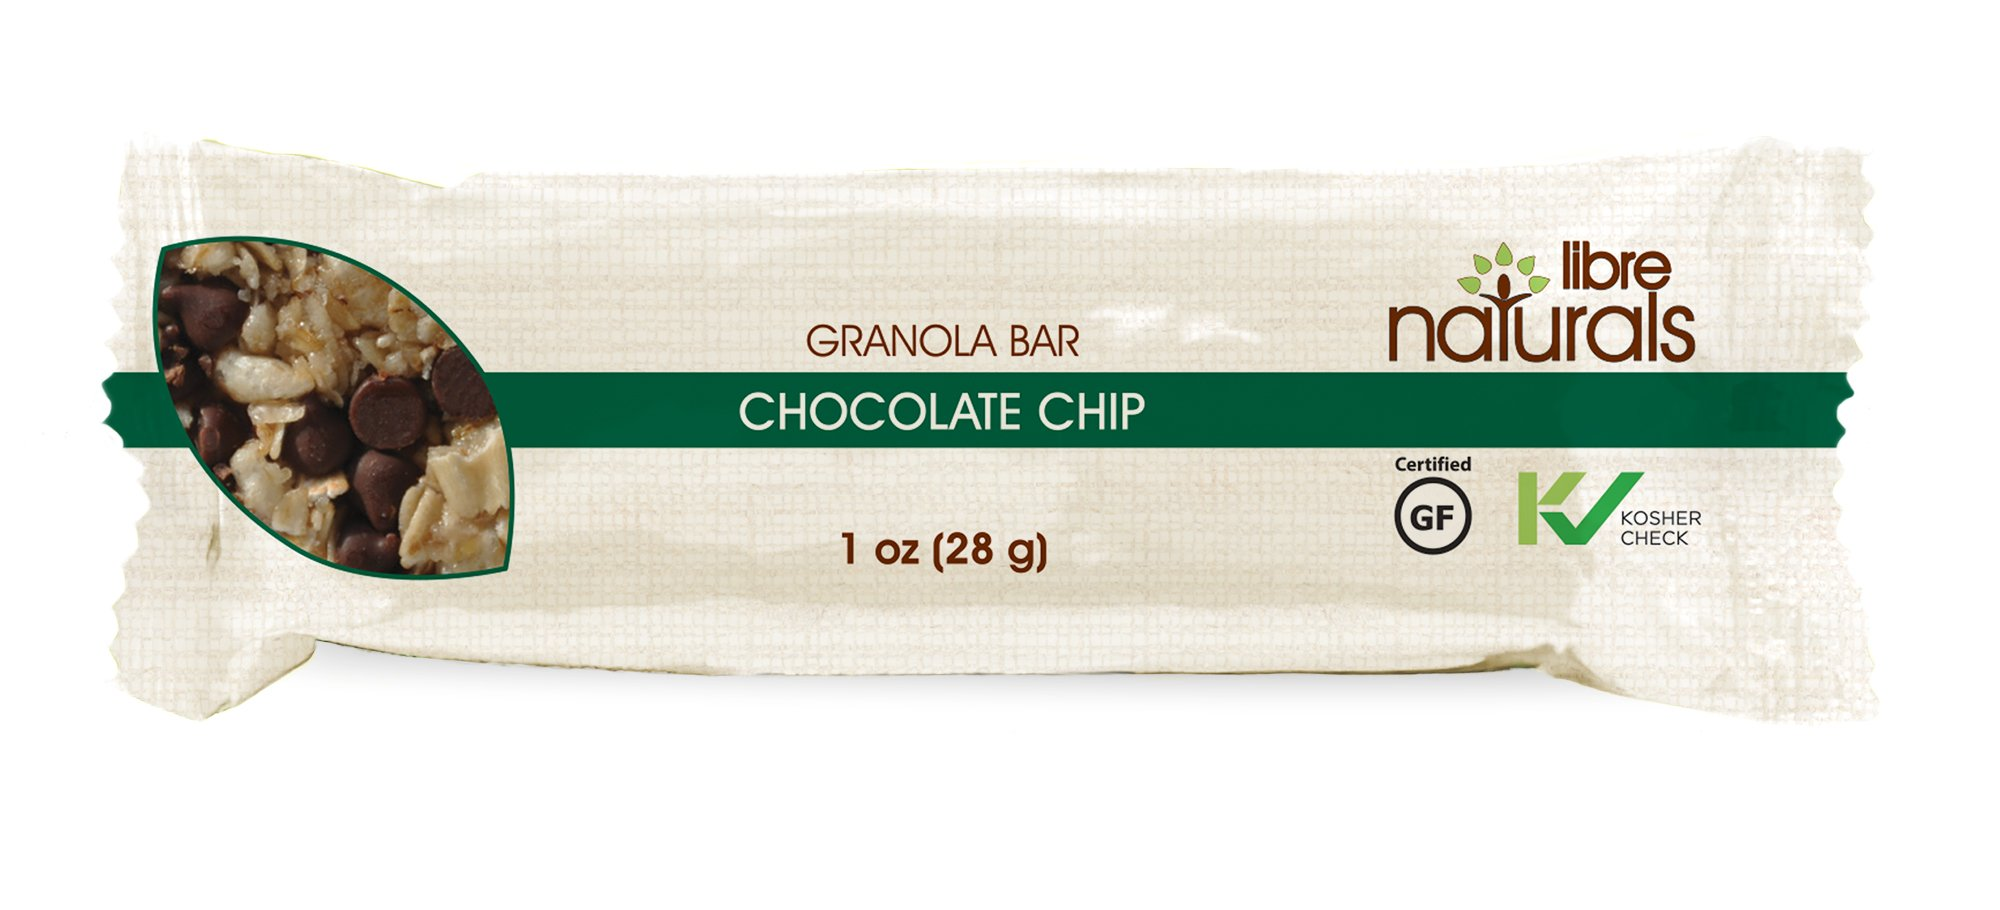 Nut Free, Gluten Free >> Chocolate Chip Vegan Granola Bar - Libre Naturals, 28 gram, 100 Bar Bulk Case